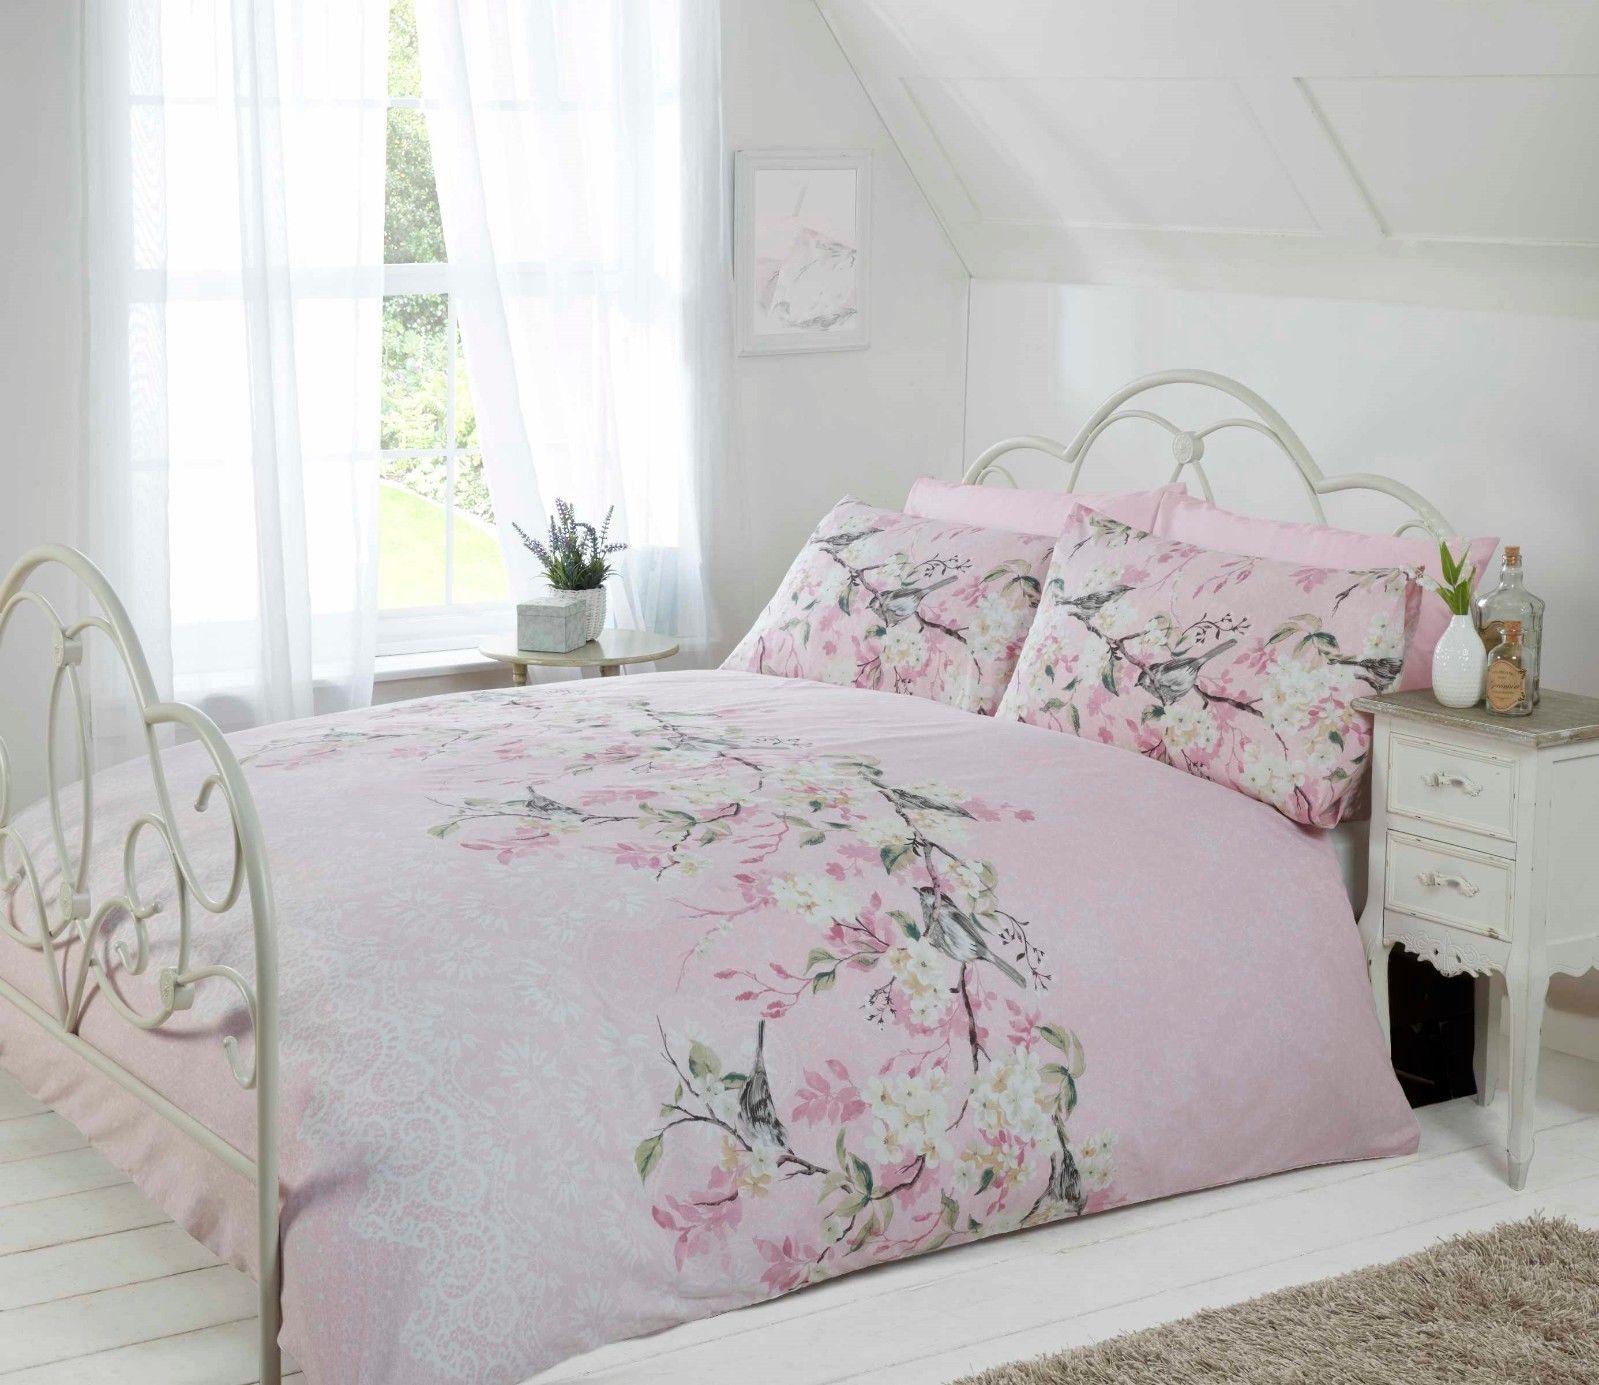 Rapport Eloise Vintage Floral Shabby Chic BlushSoft Pink Duvet Cover Bedding Set BB Textiles